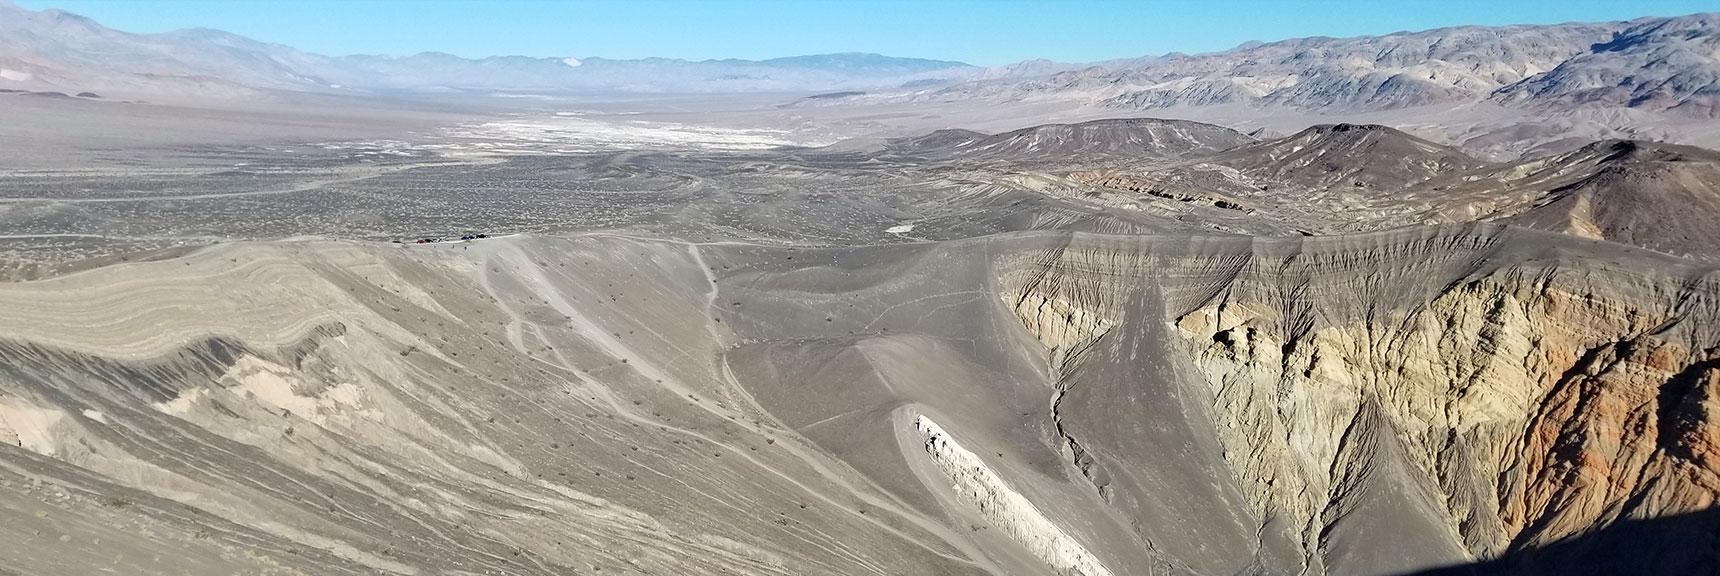 Death Valley National Park Ubehebe Crater November 24th 2018